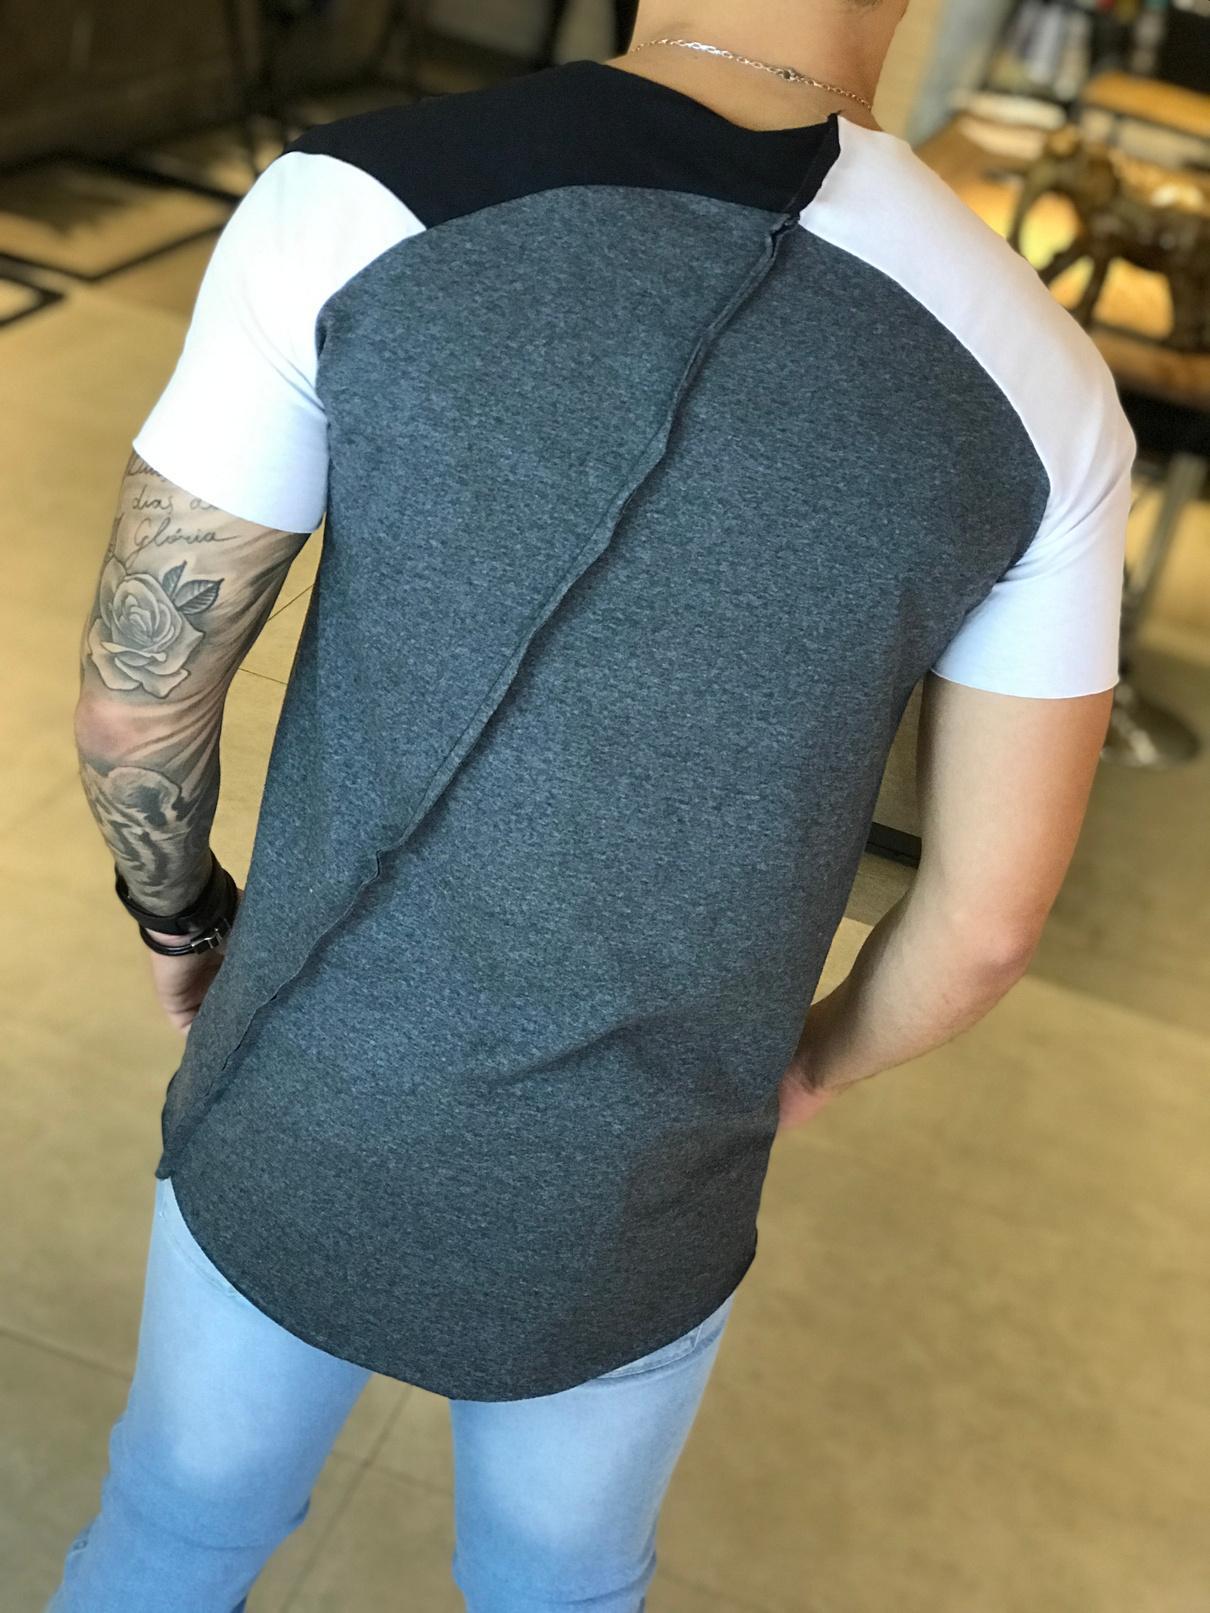 Camisa Manga Longa M Artt Cinza Detalhe Costas  - Harpia Moda - Moda Masculina & Acessórios